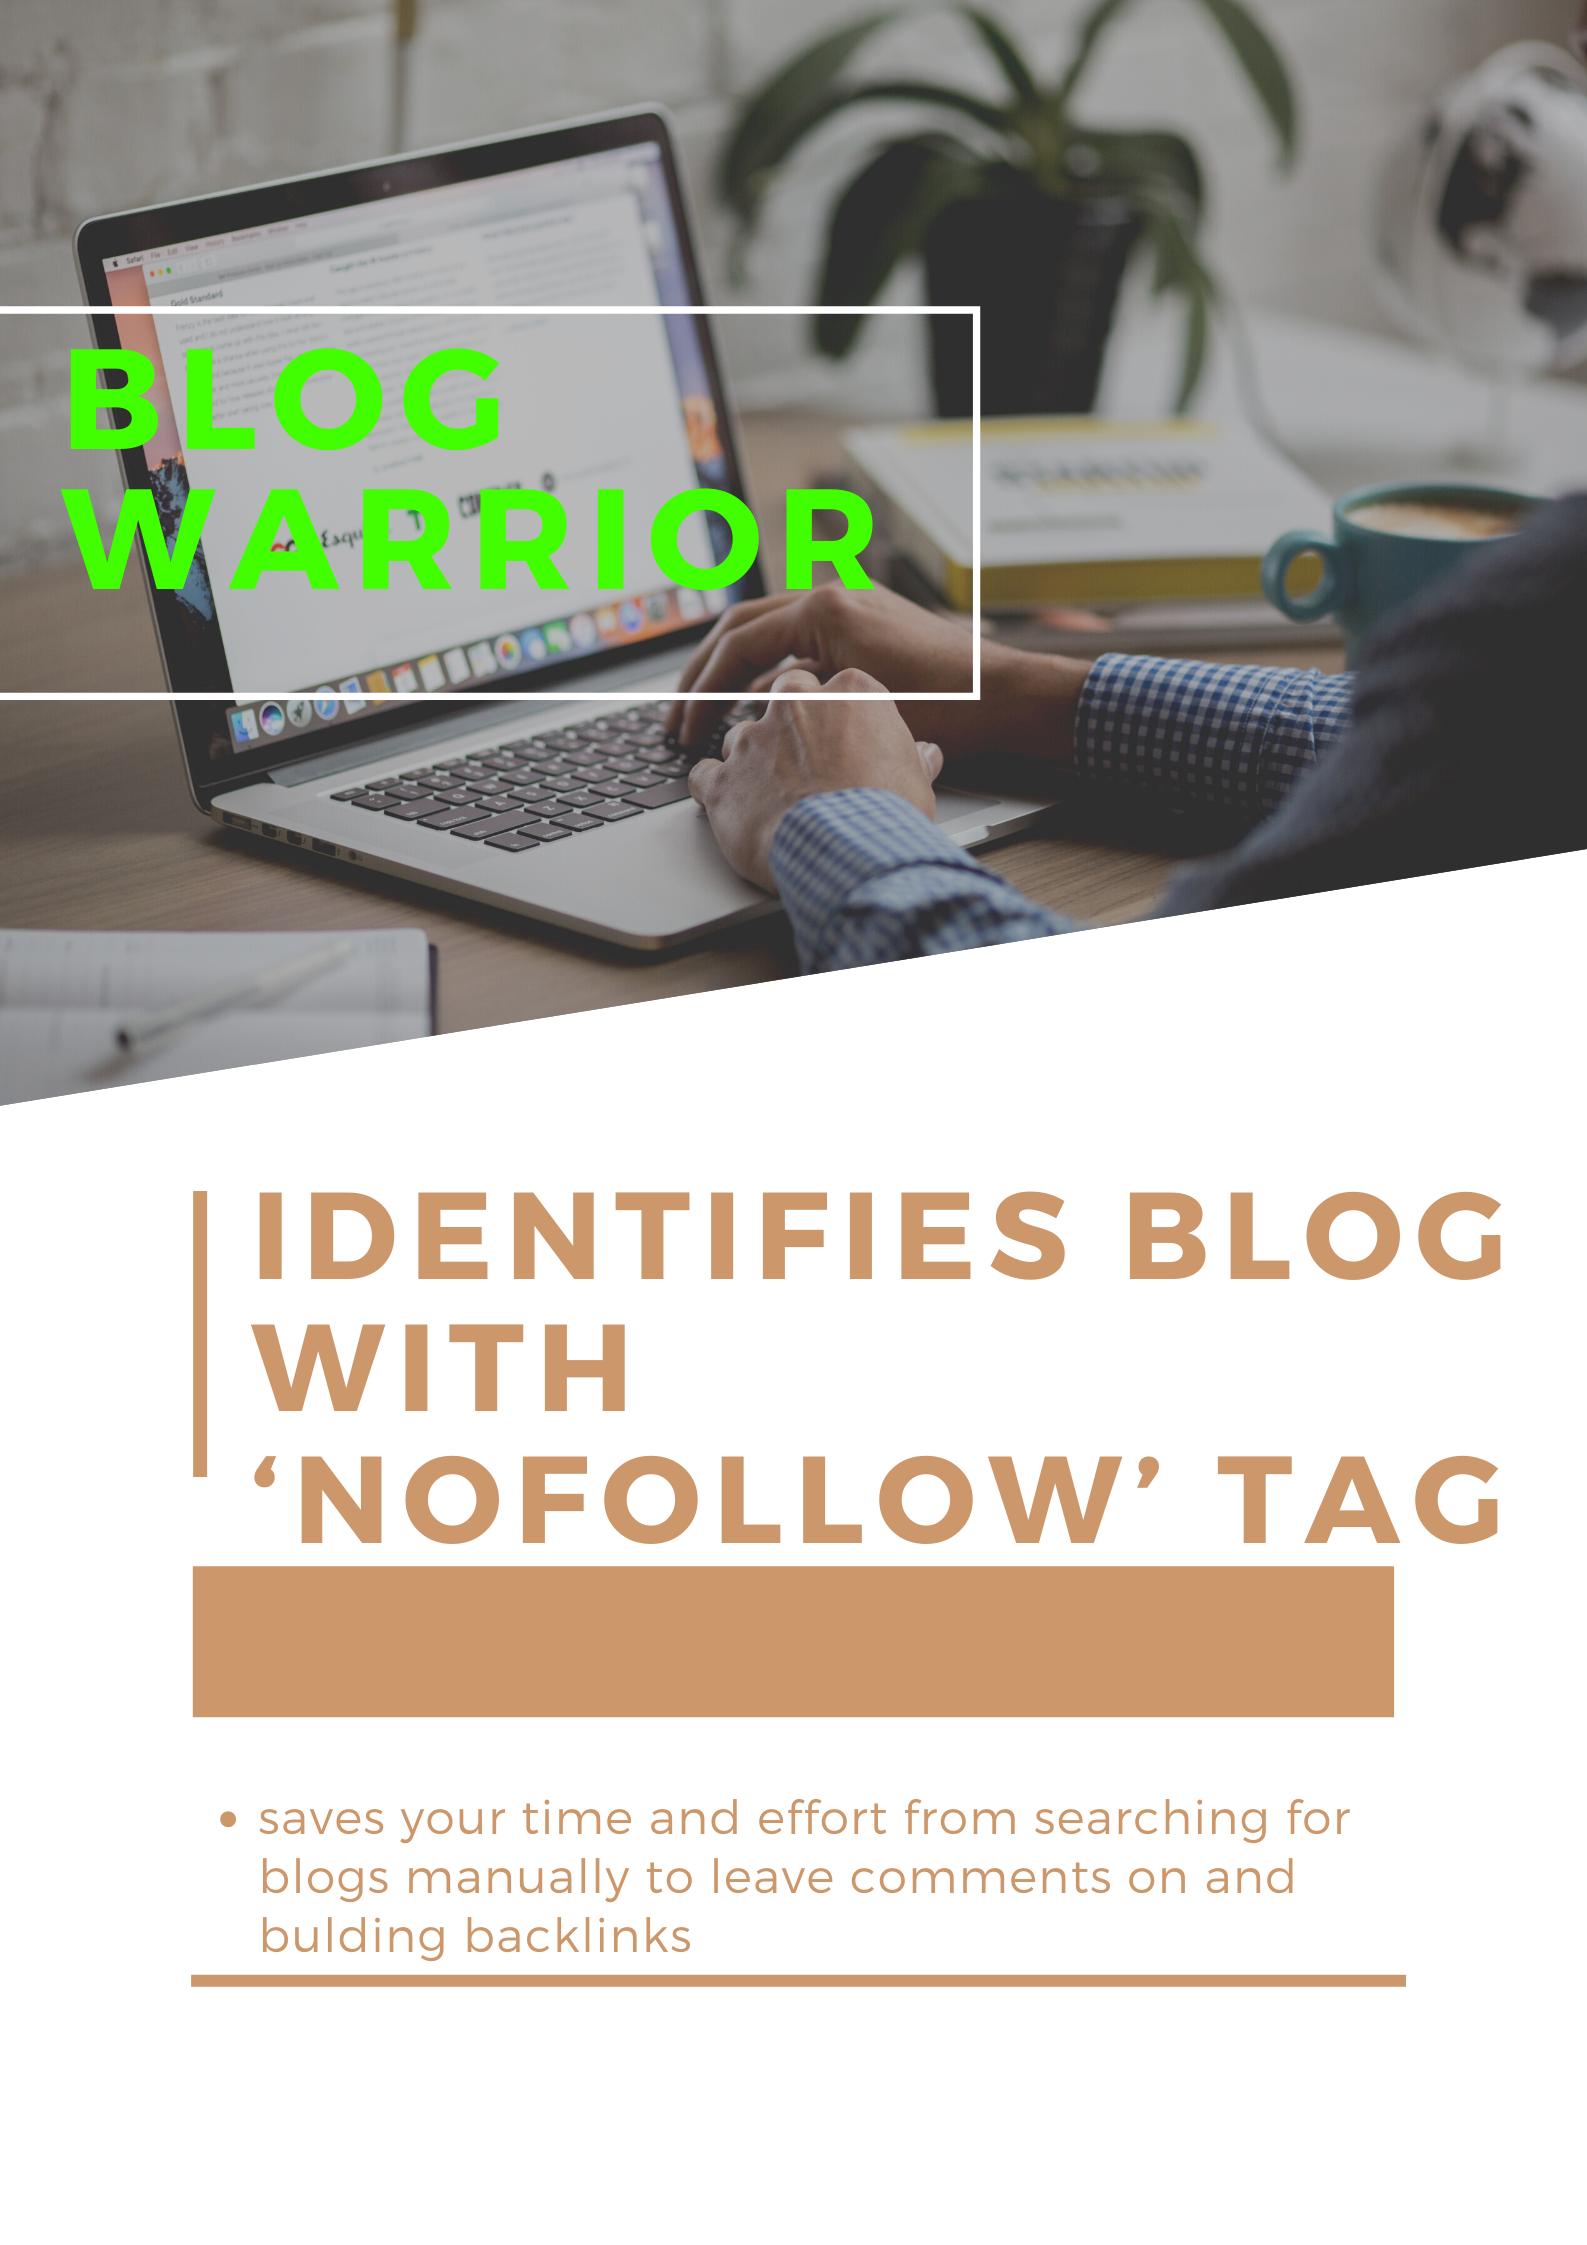 Blog warrior-Identifies wordpress blog with nofollow tag